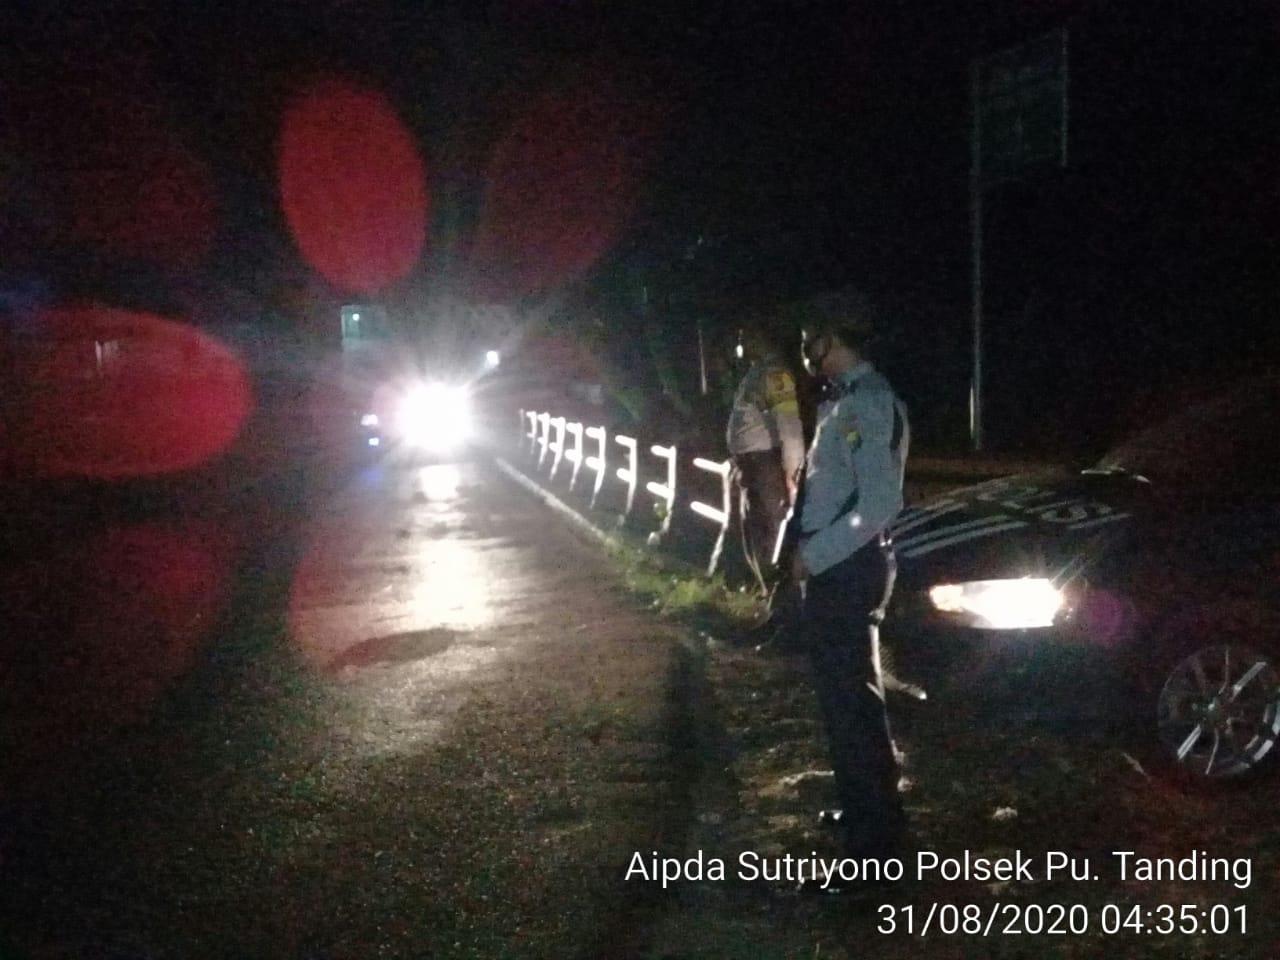 Cegah Kriminalitas, Polsek PUT Tingkatkan Patroli dan Sambang Kamtibmas